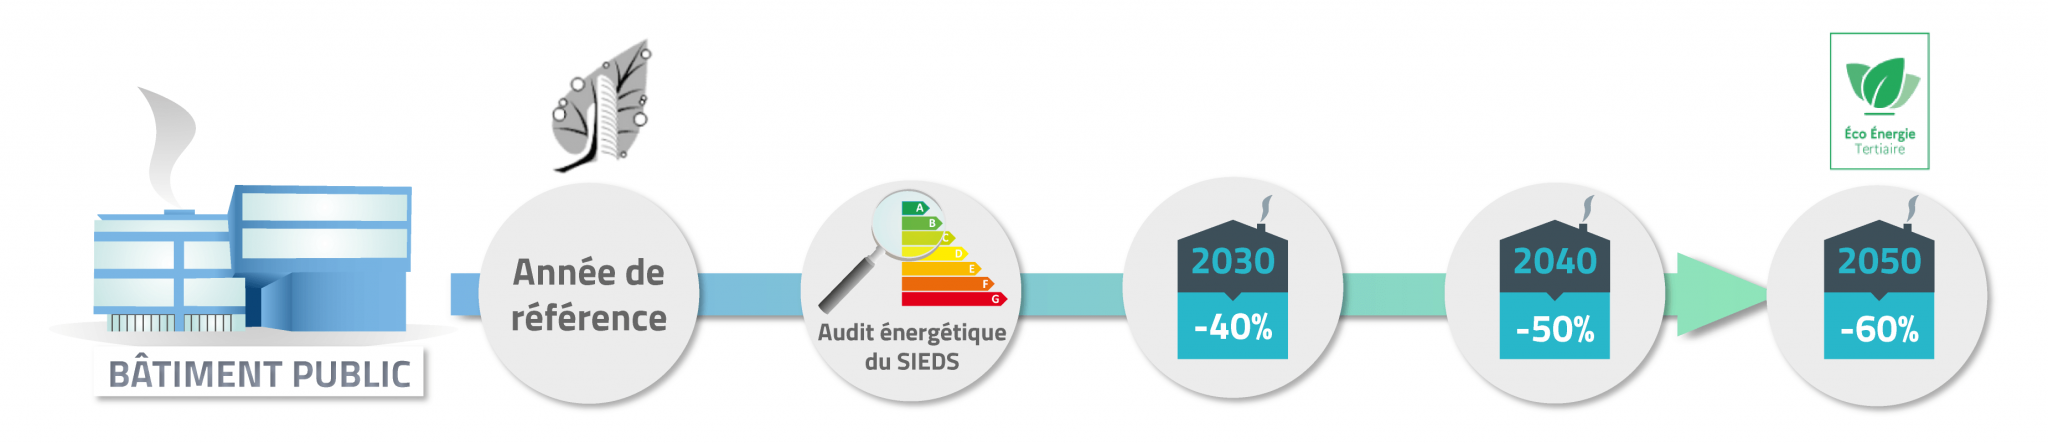 audit_energetique_SIEDS(1)